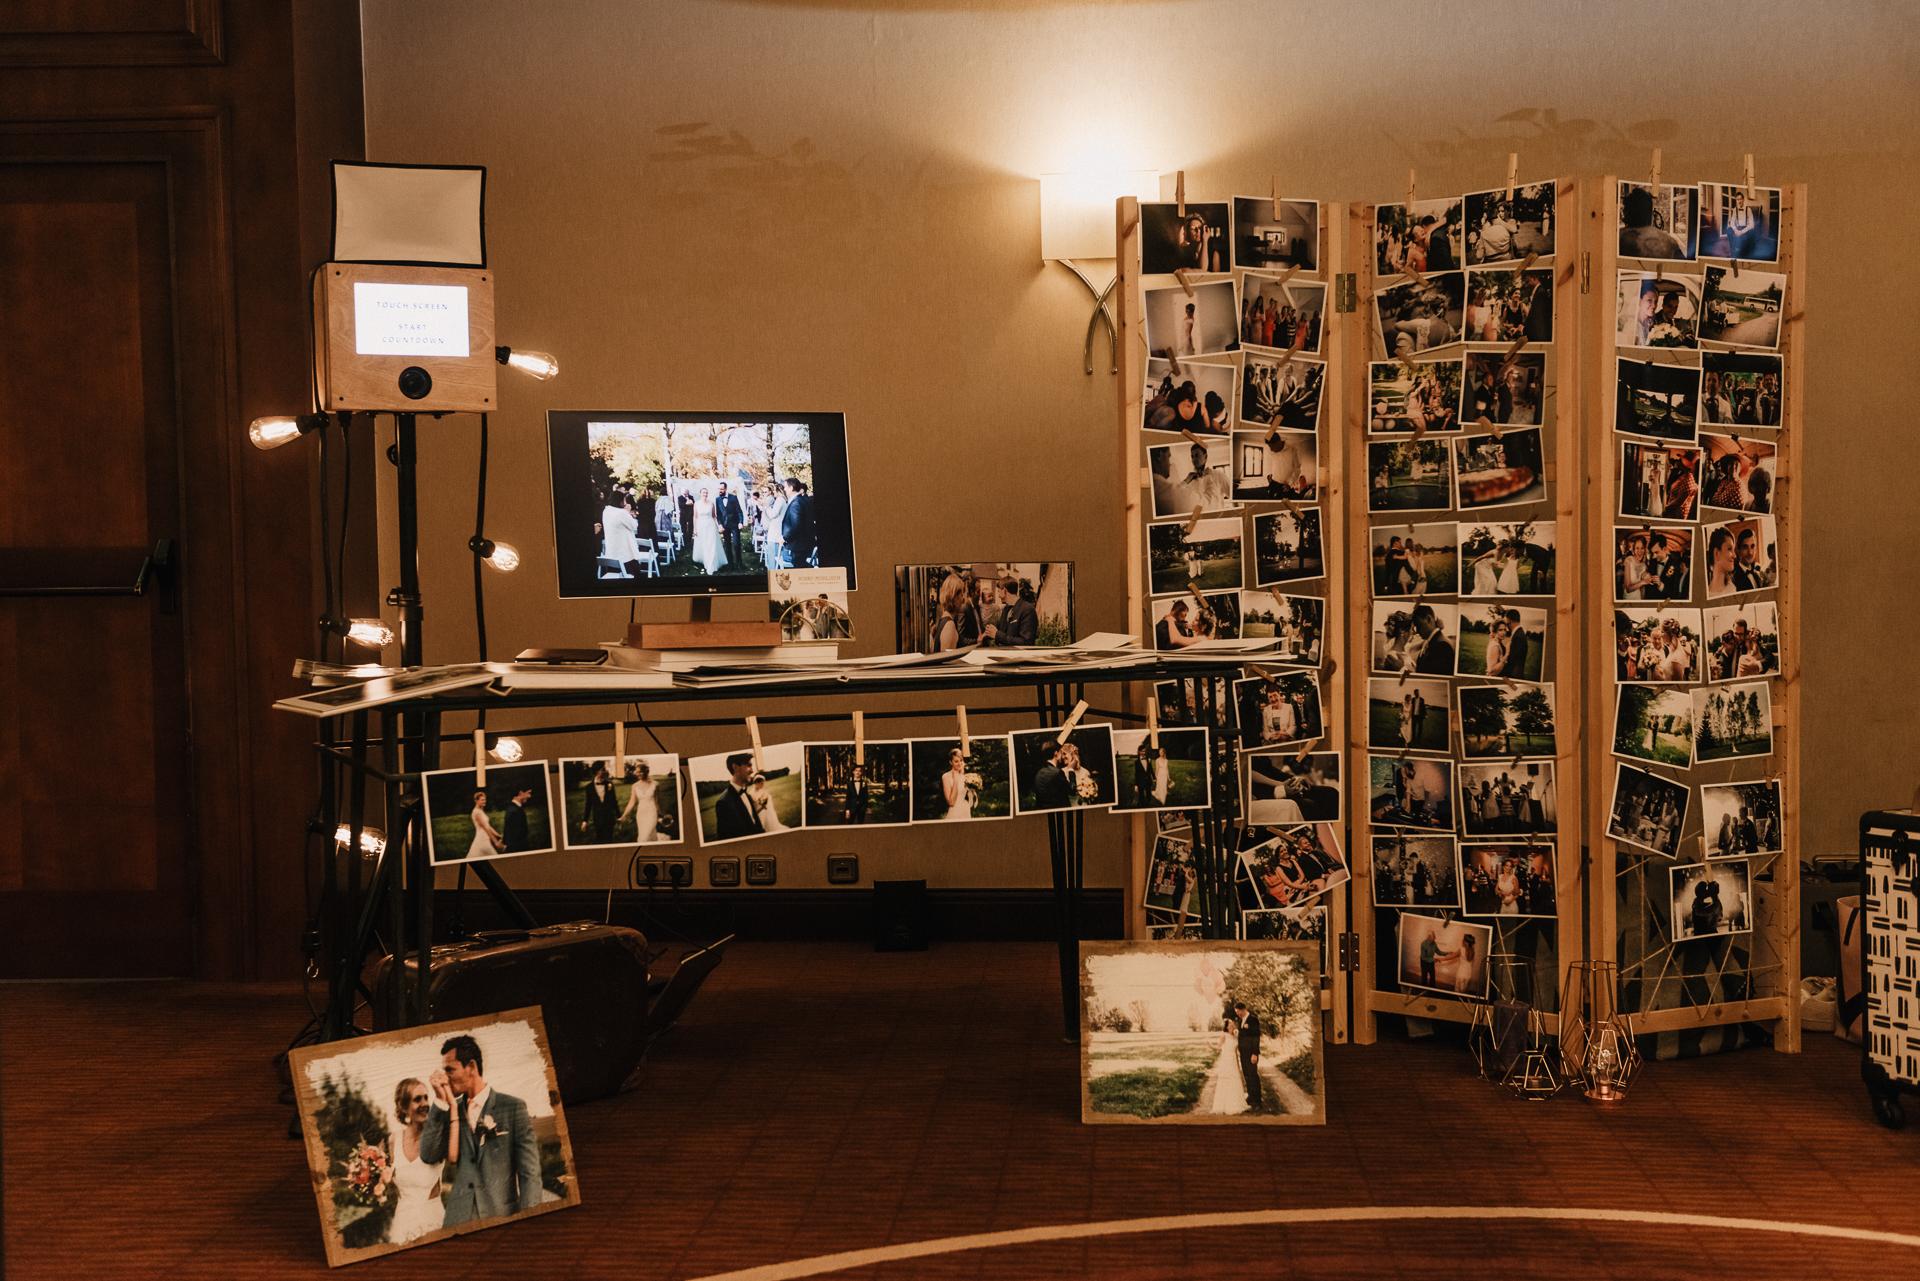 Zweinander-LeonoreHerzog-WeddingMarket-OnTour20191110-9411